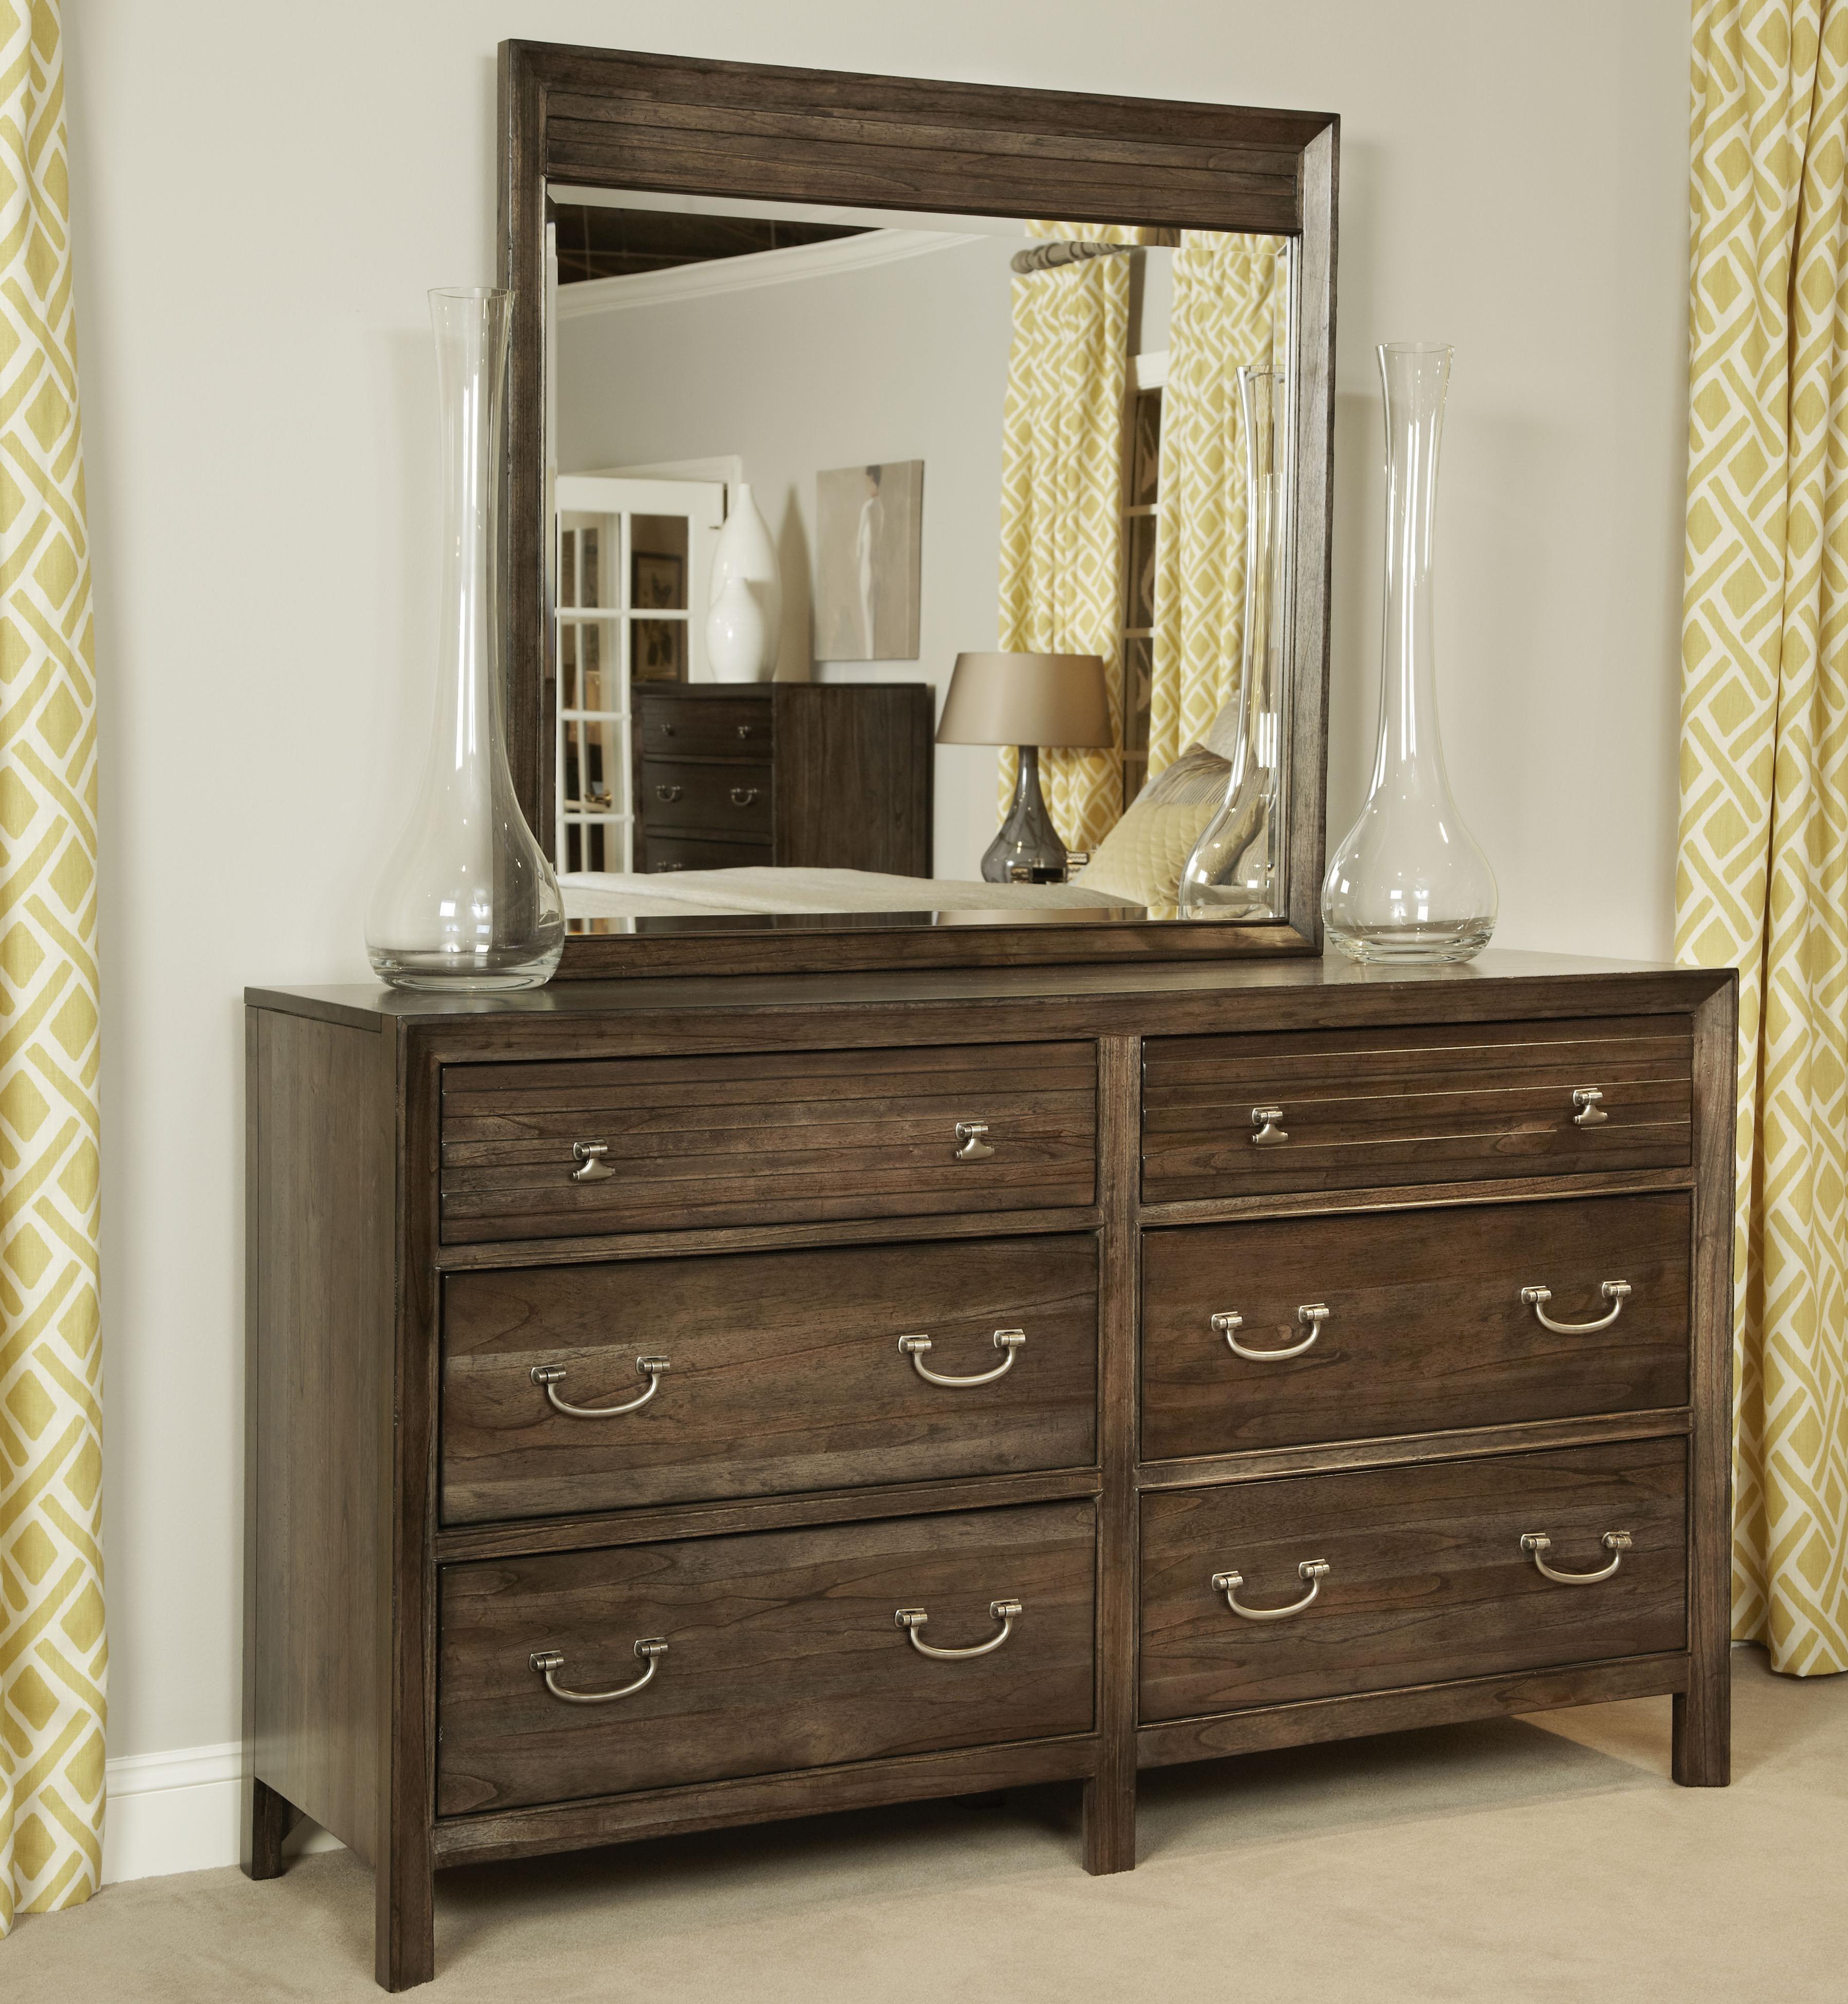 Kincaid Furniture Montreat Dresser & Mirror - Item Number: 84-160+84-114